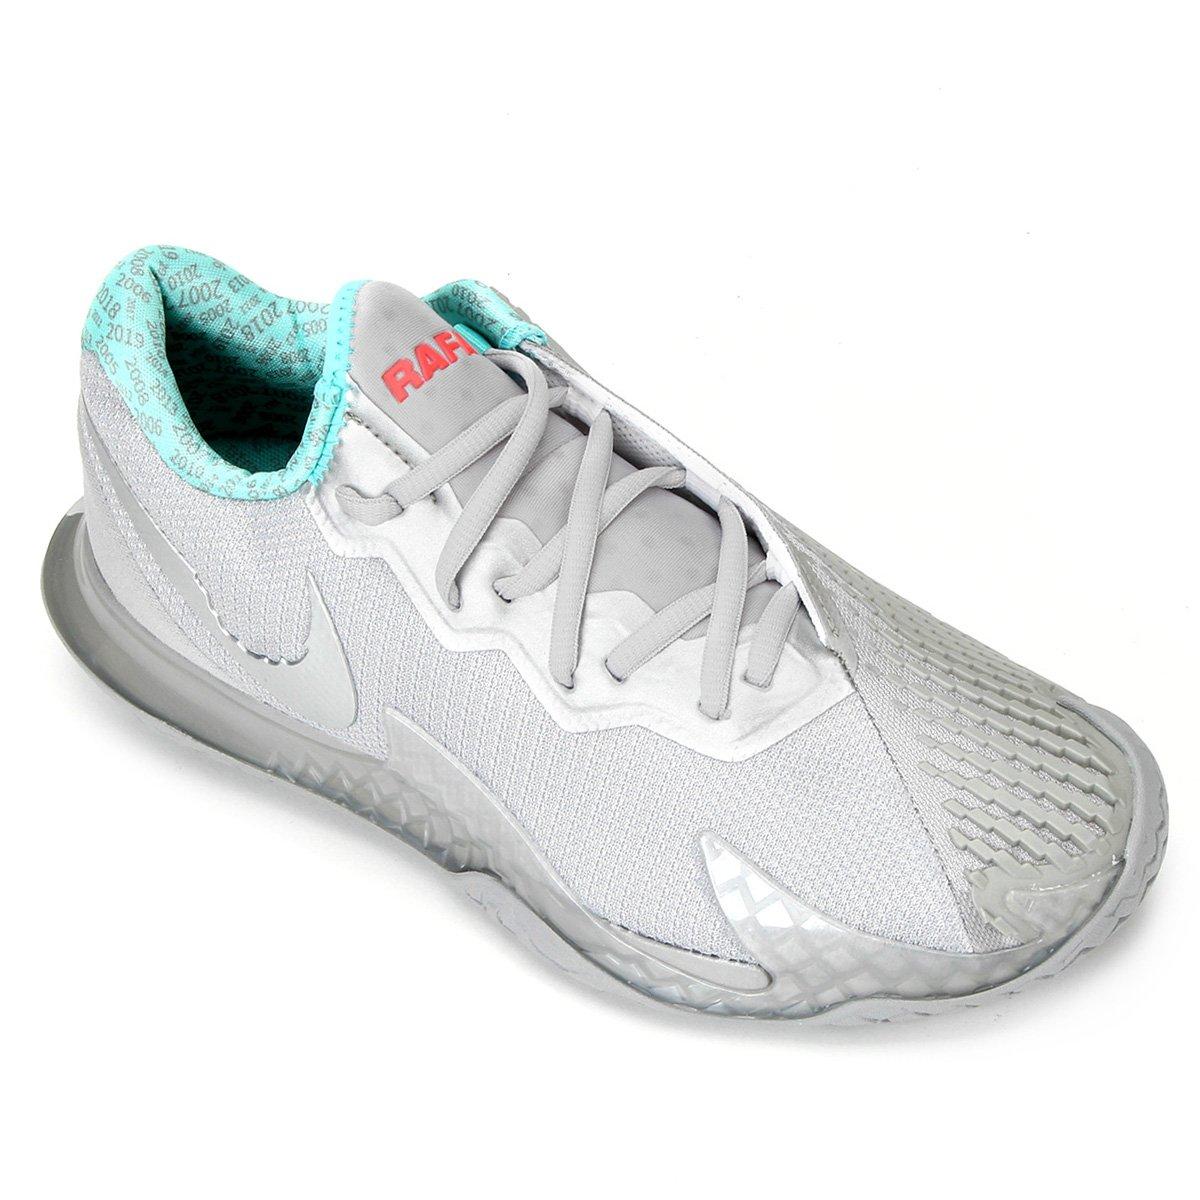 Tênis Nike Air Zoom Vapor Cage 4 HC Prata